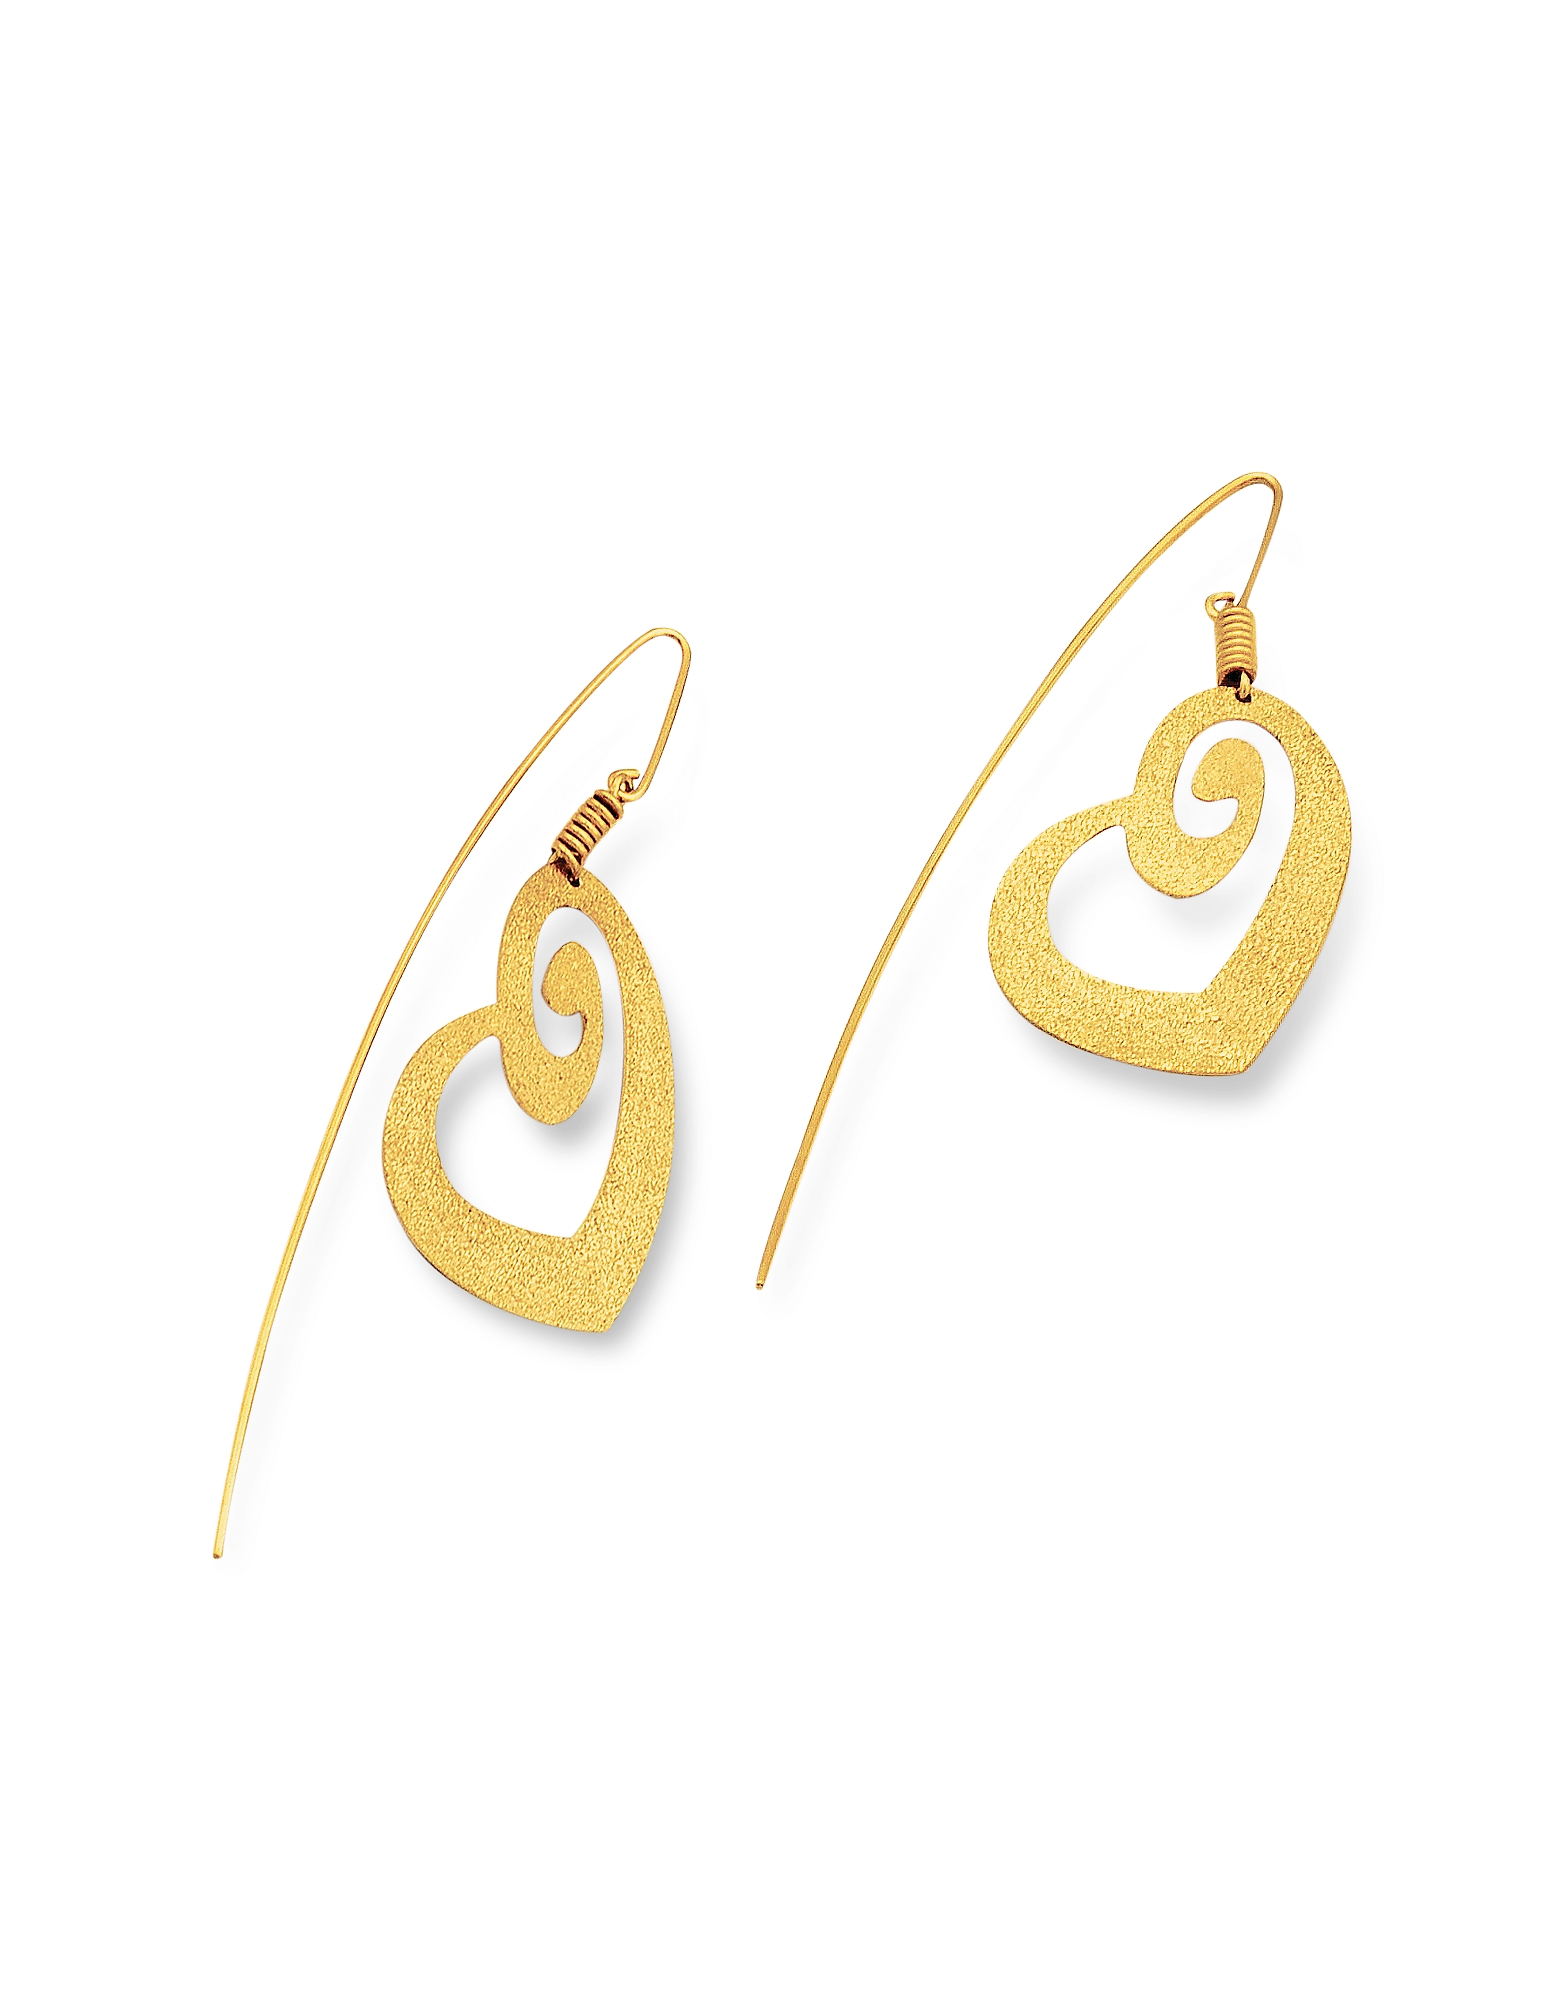 Stefano Patriarchi 帕特雅克 耳环, 金银色刻纹心形吊式耳环